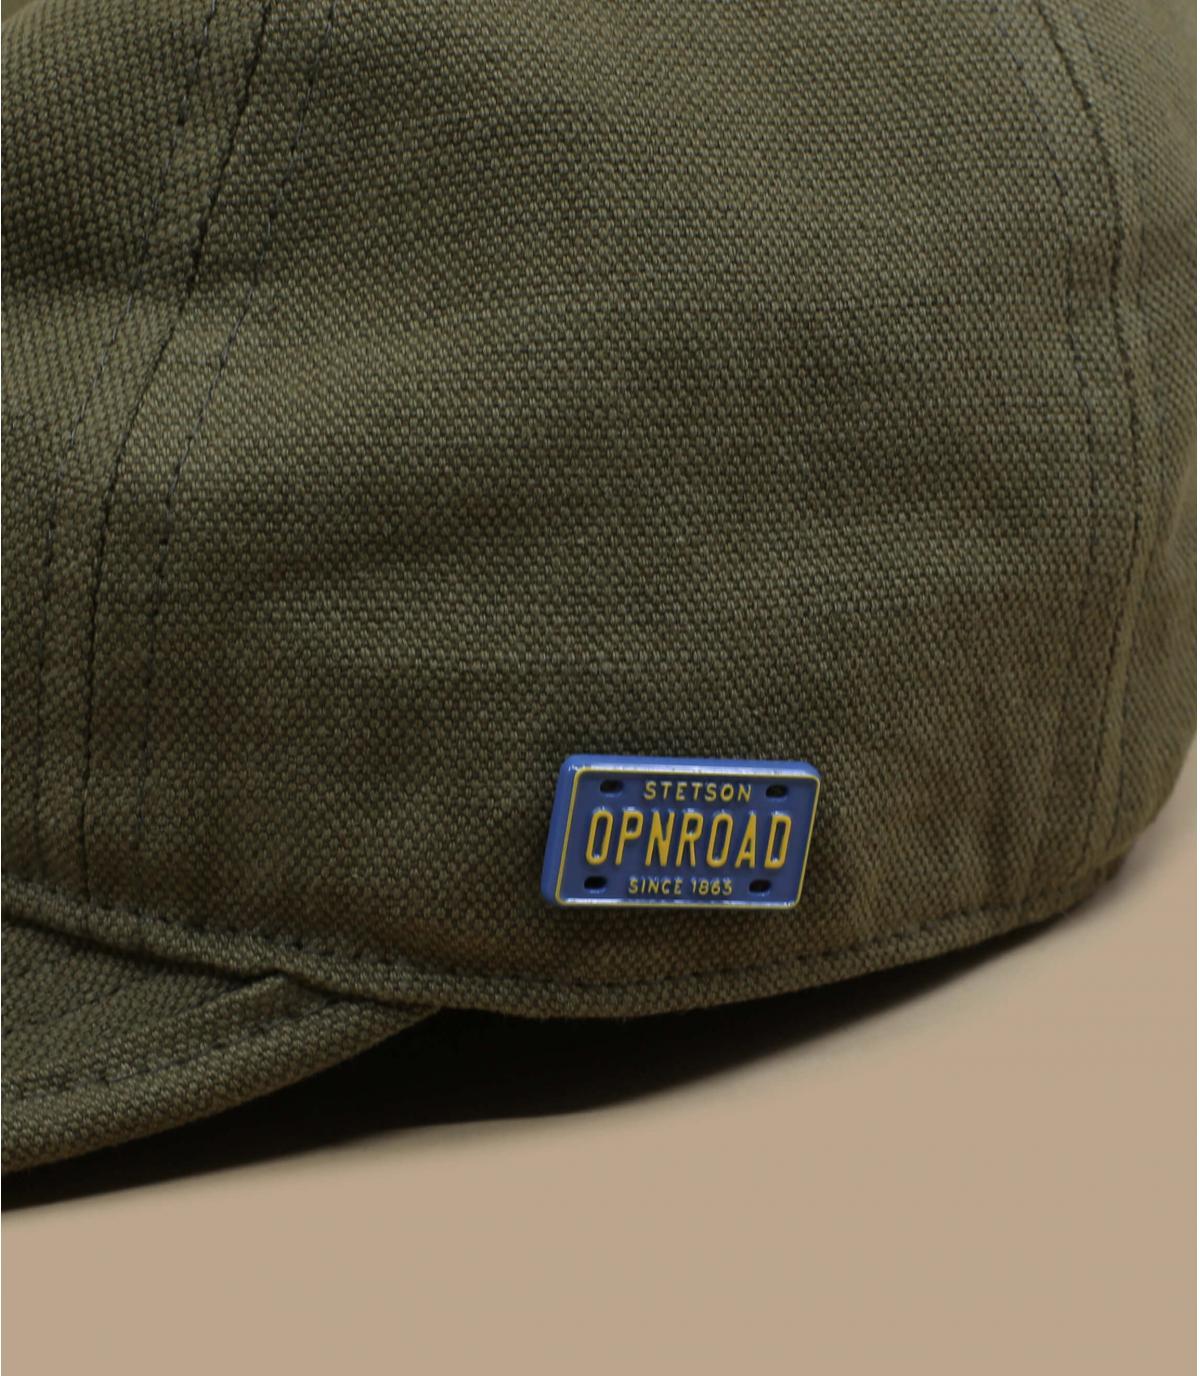 Details Engineer Cap Cotton Linen olive - afbeeling 2